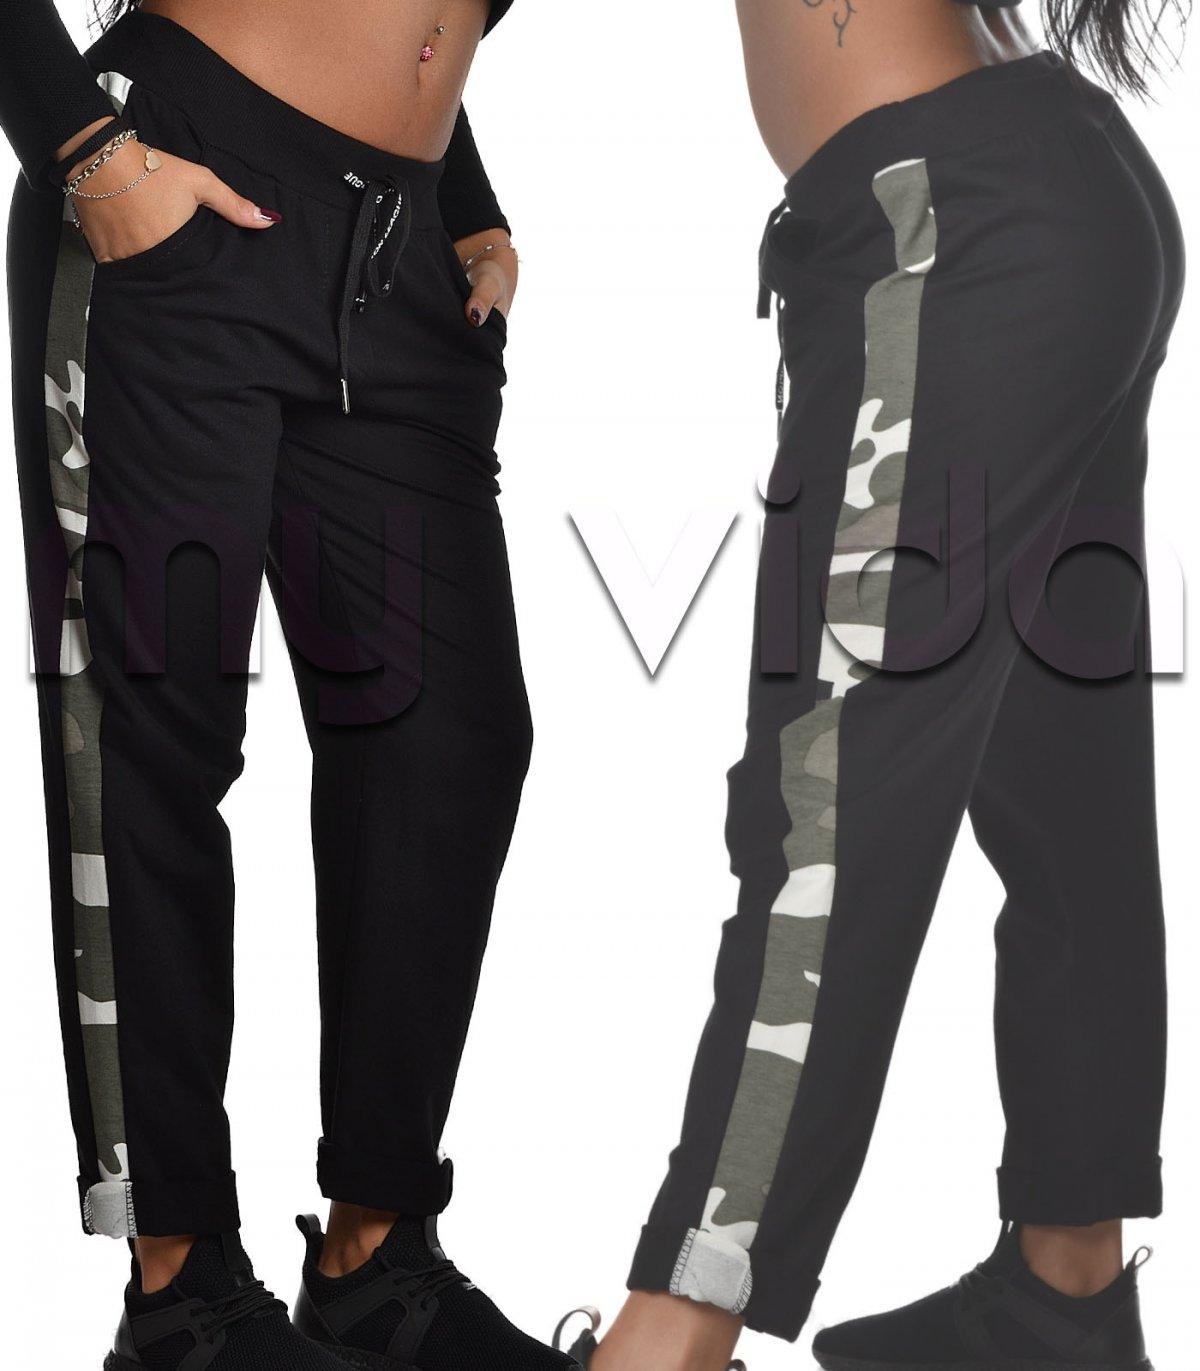 53671d0637 Tuta camuflage mimetica pantalone bottoni | My Vida